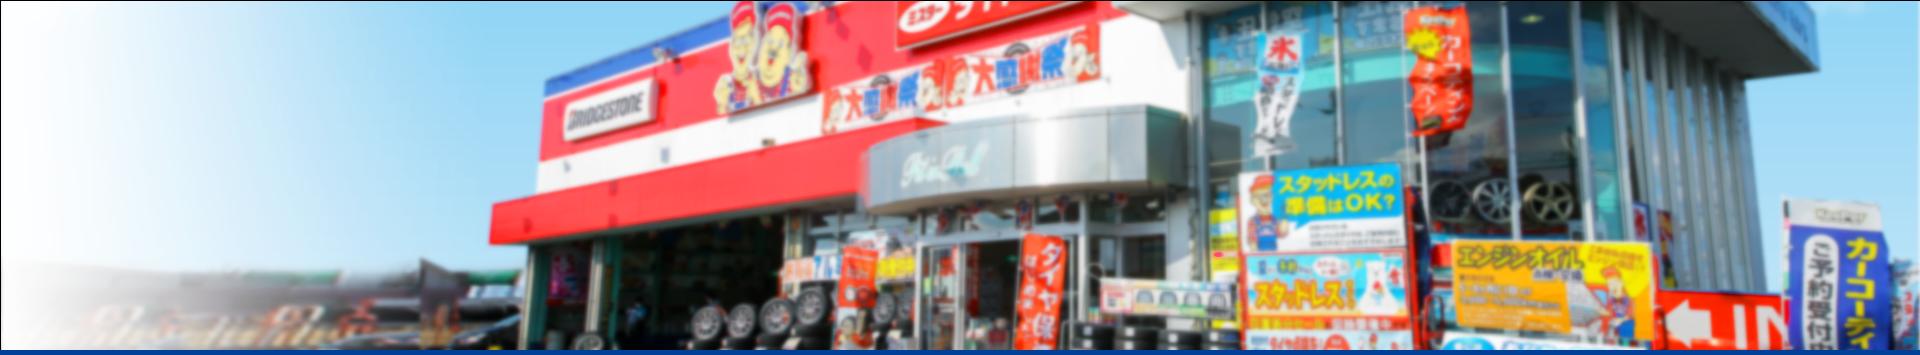 【水・日曜日限定】手洗い洗車受付中!の写真